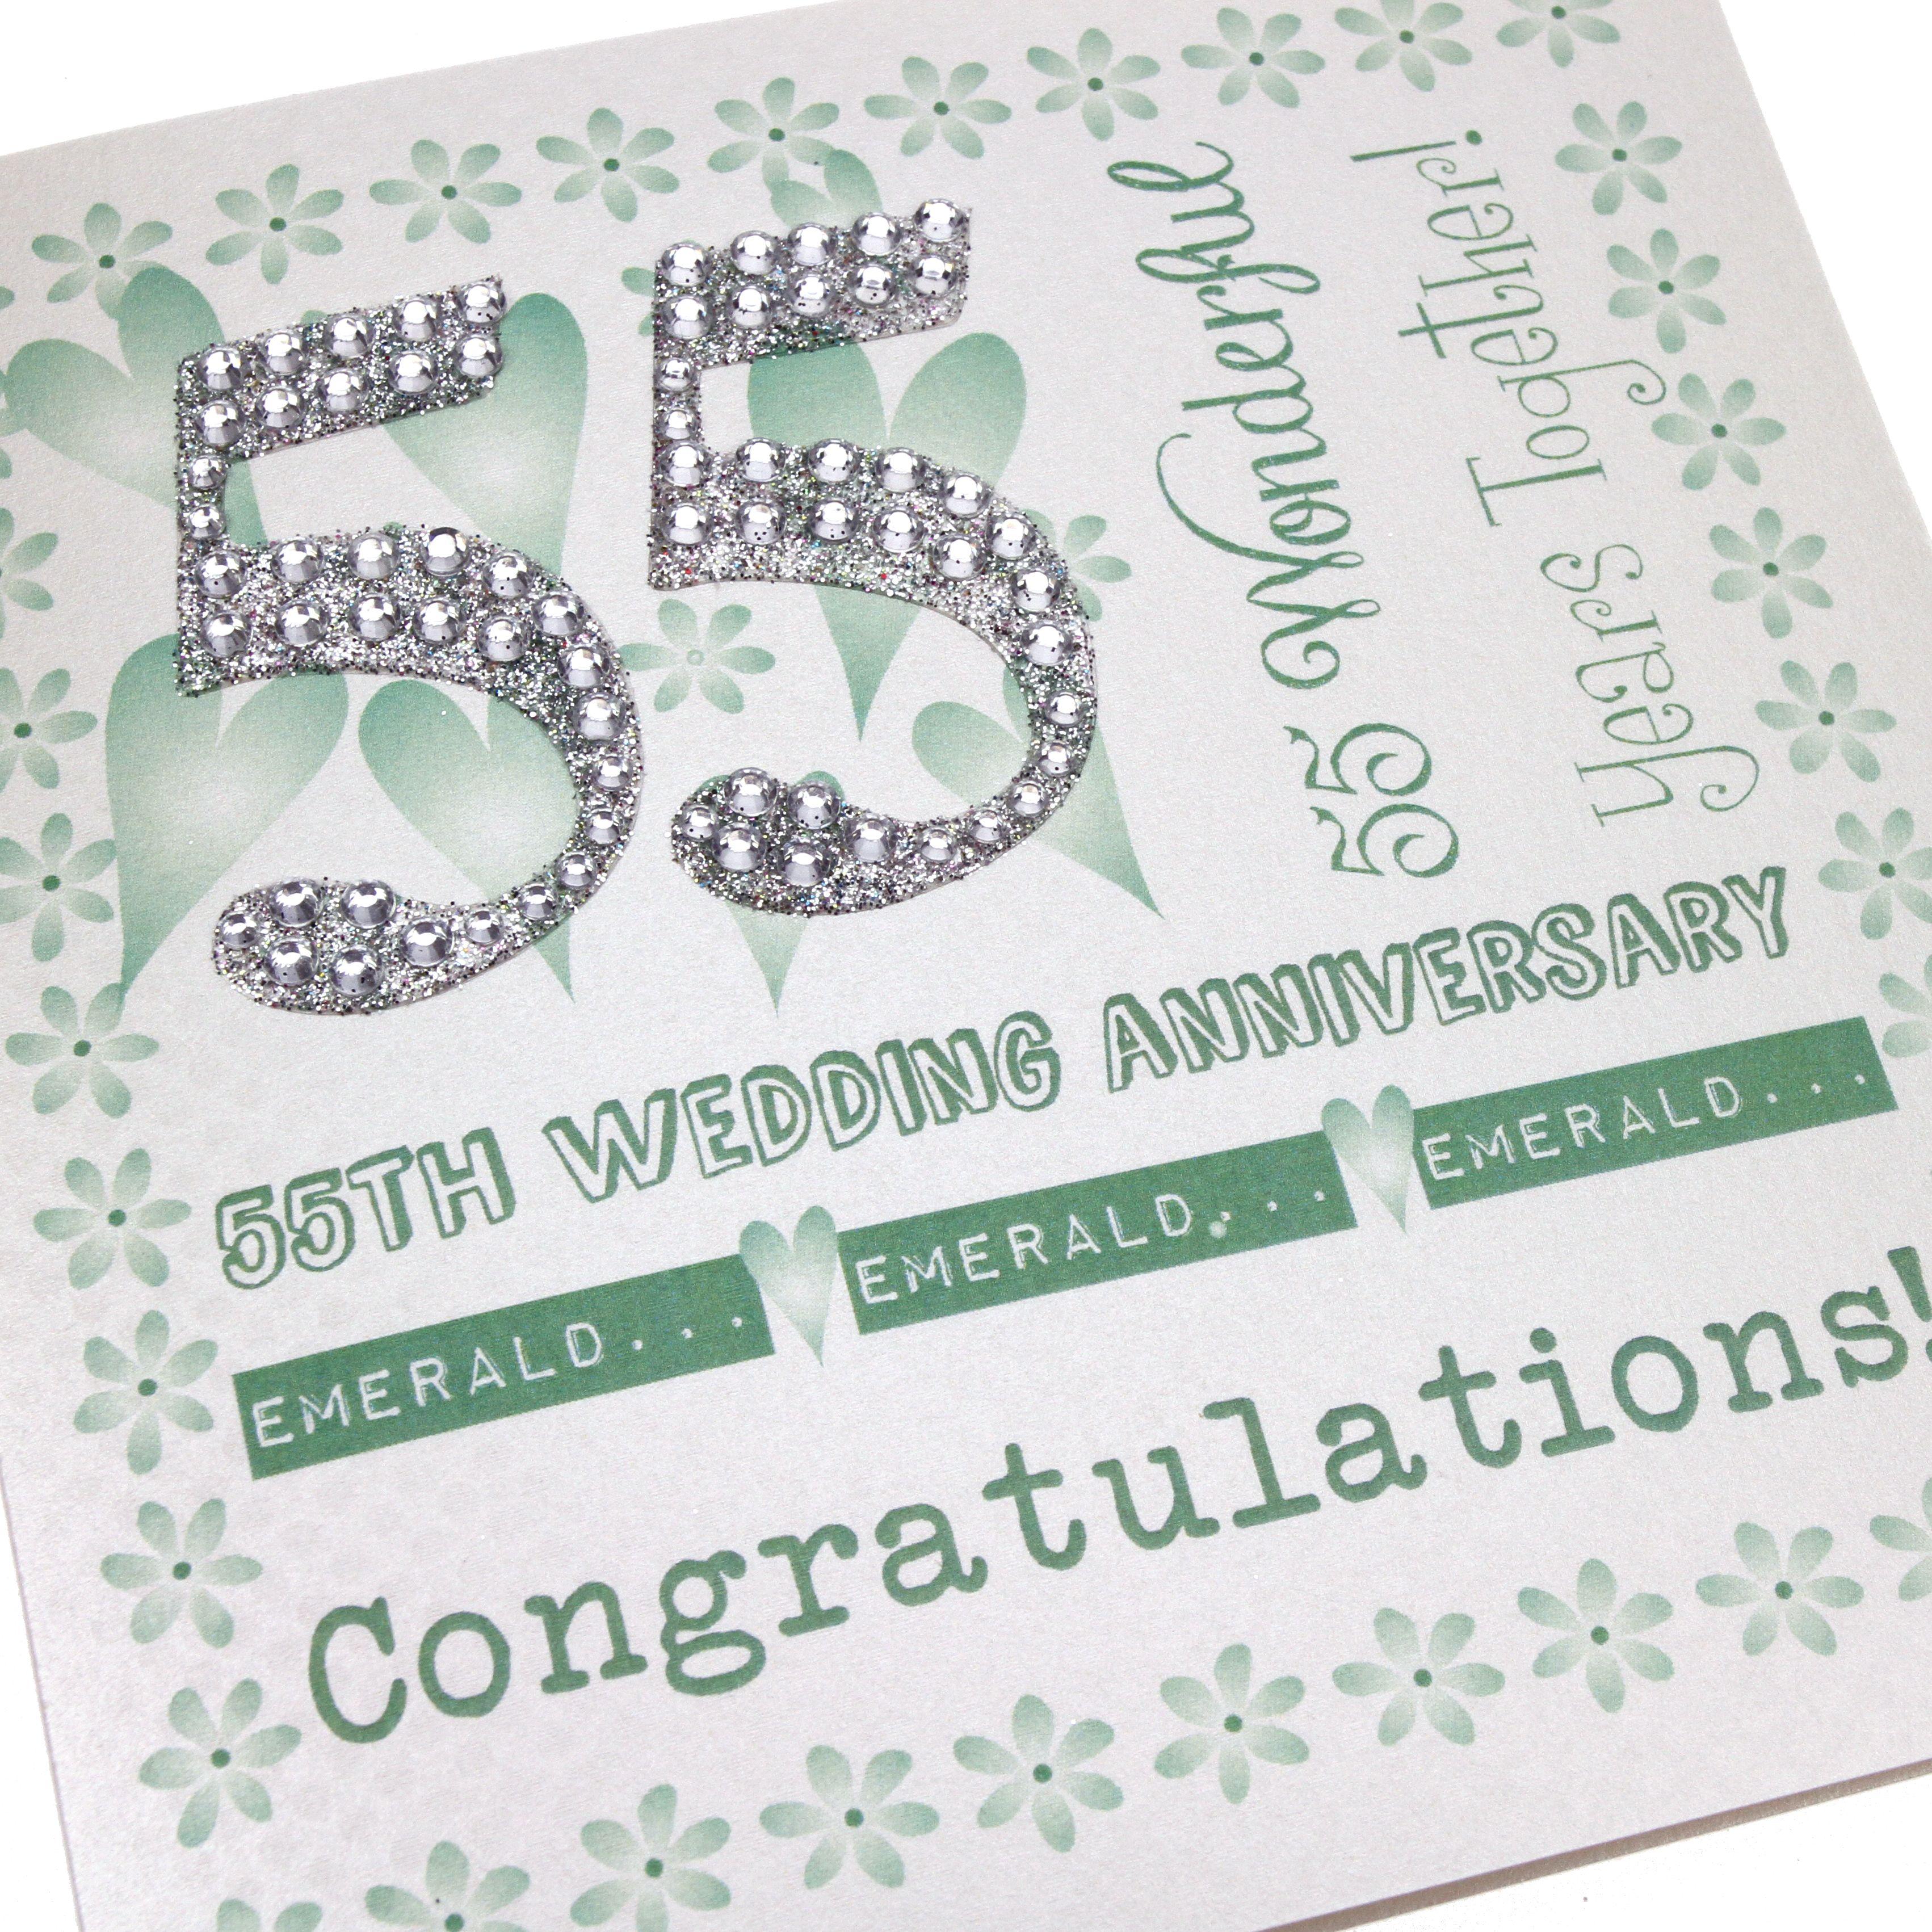 Handmade emerald anniversary card green floral border